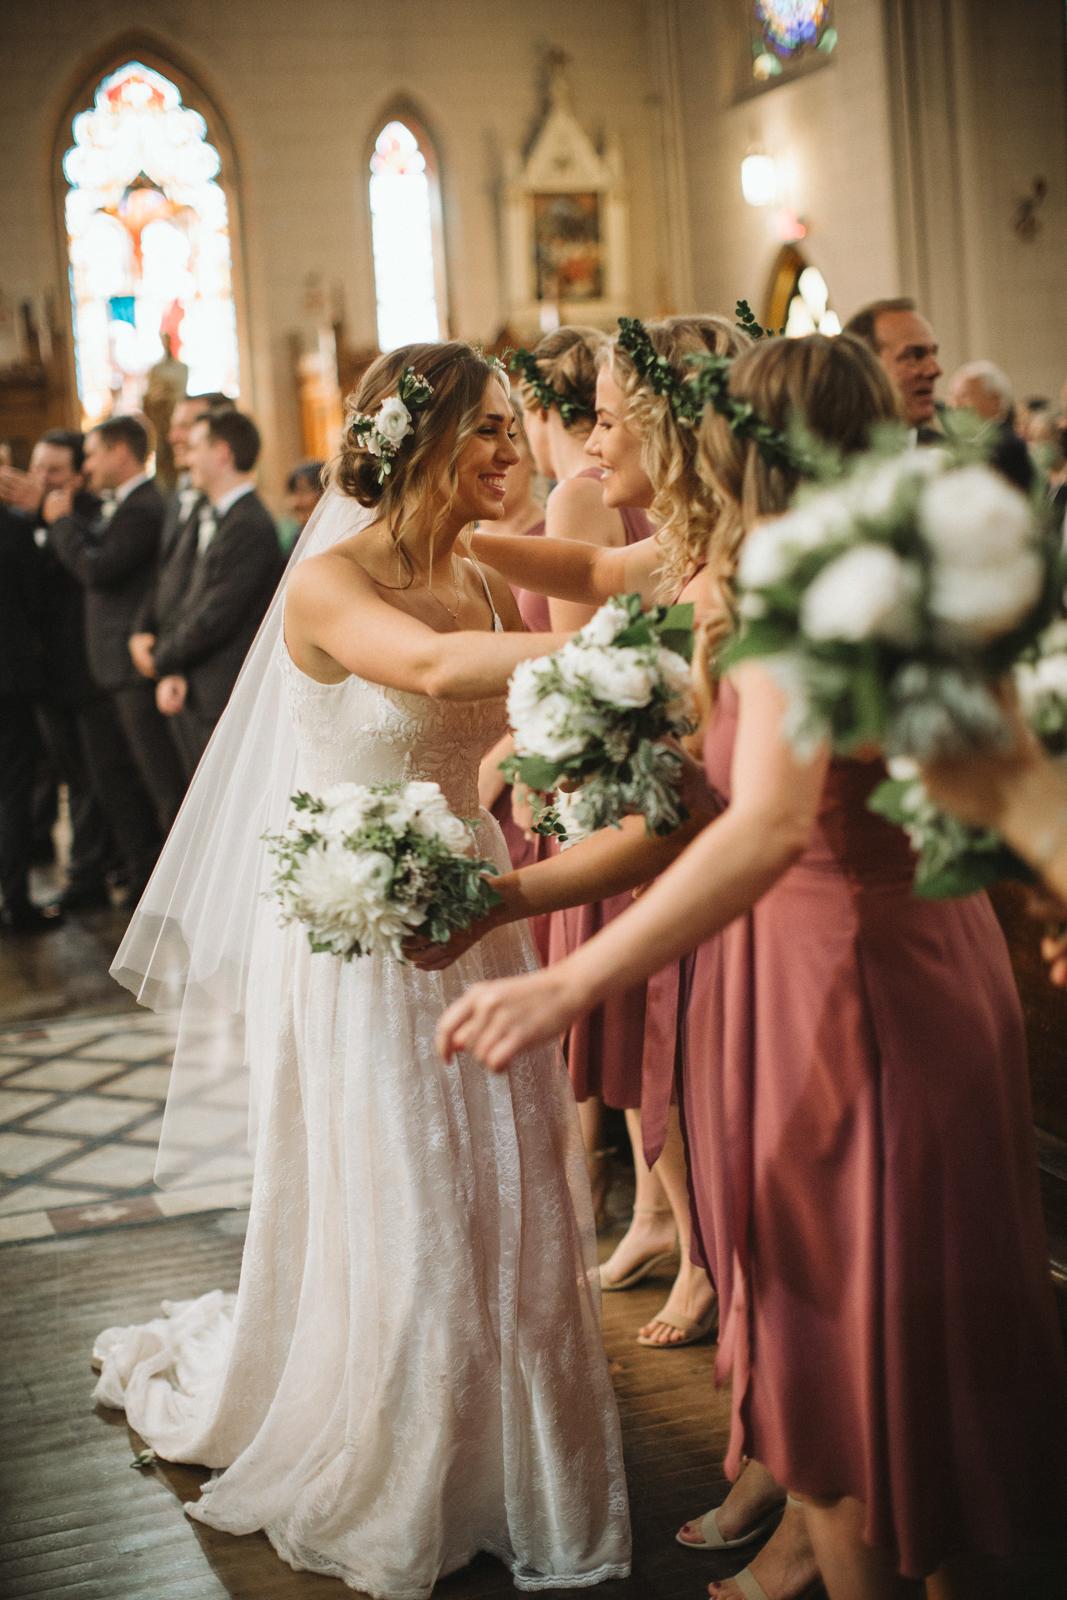 BeanandCole.com-Chris&JackieJohnson-Wedding-2023.jpg